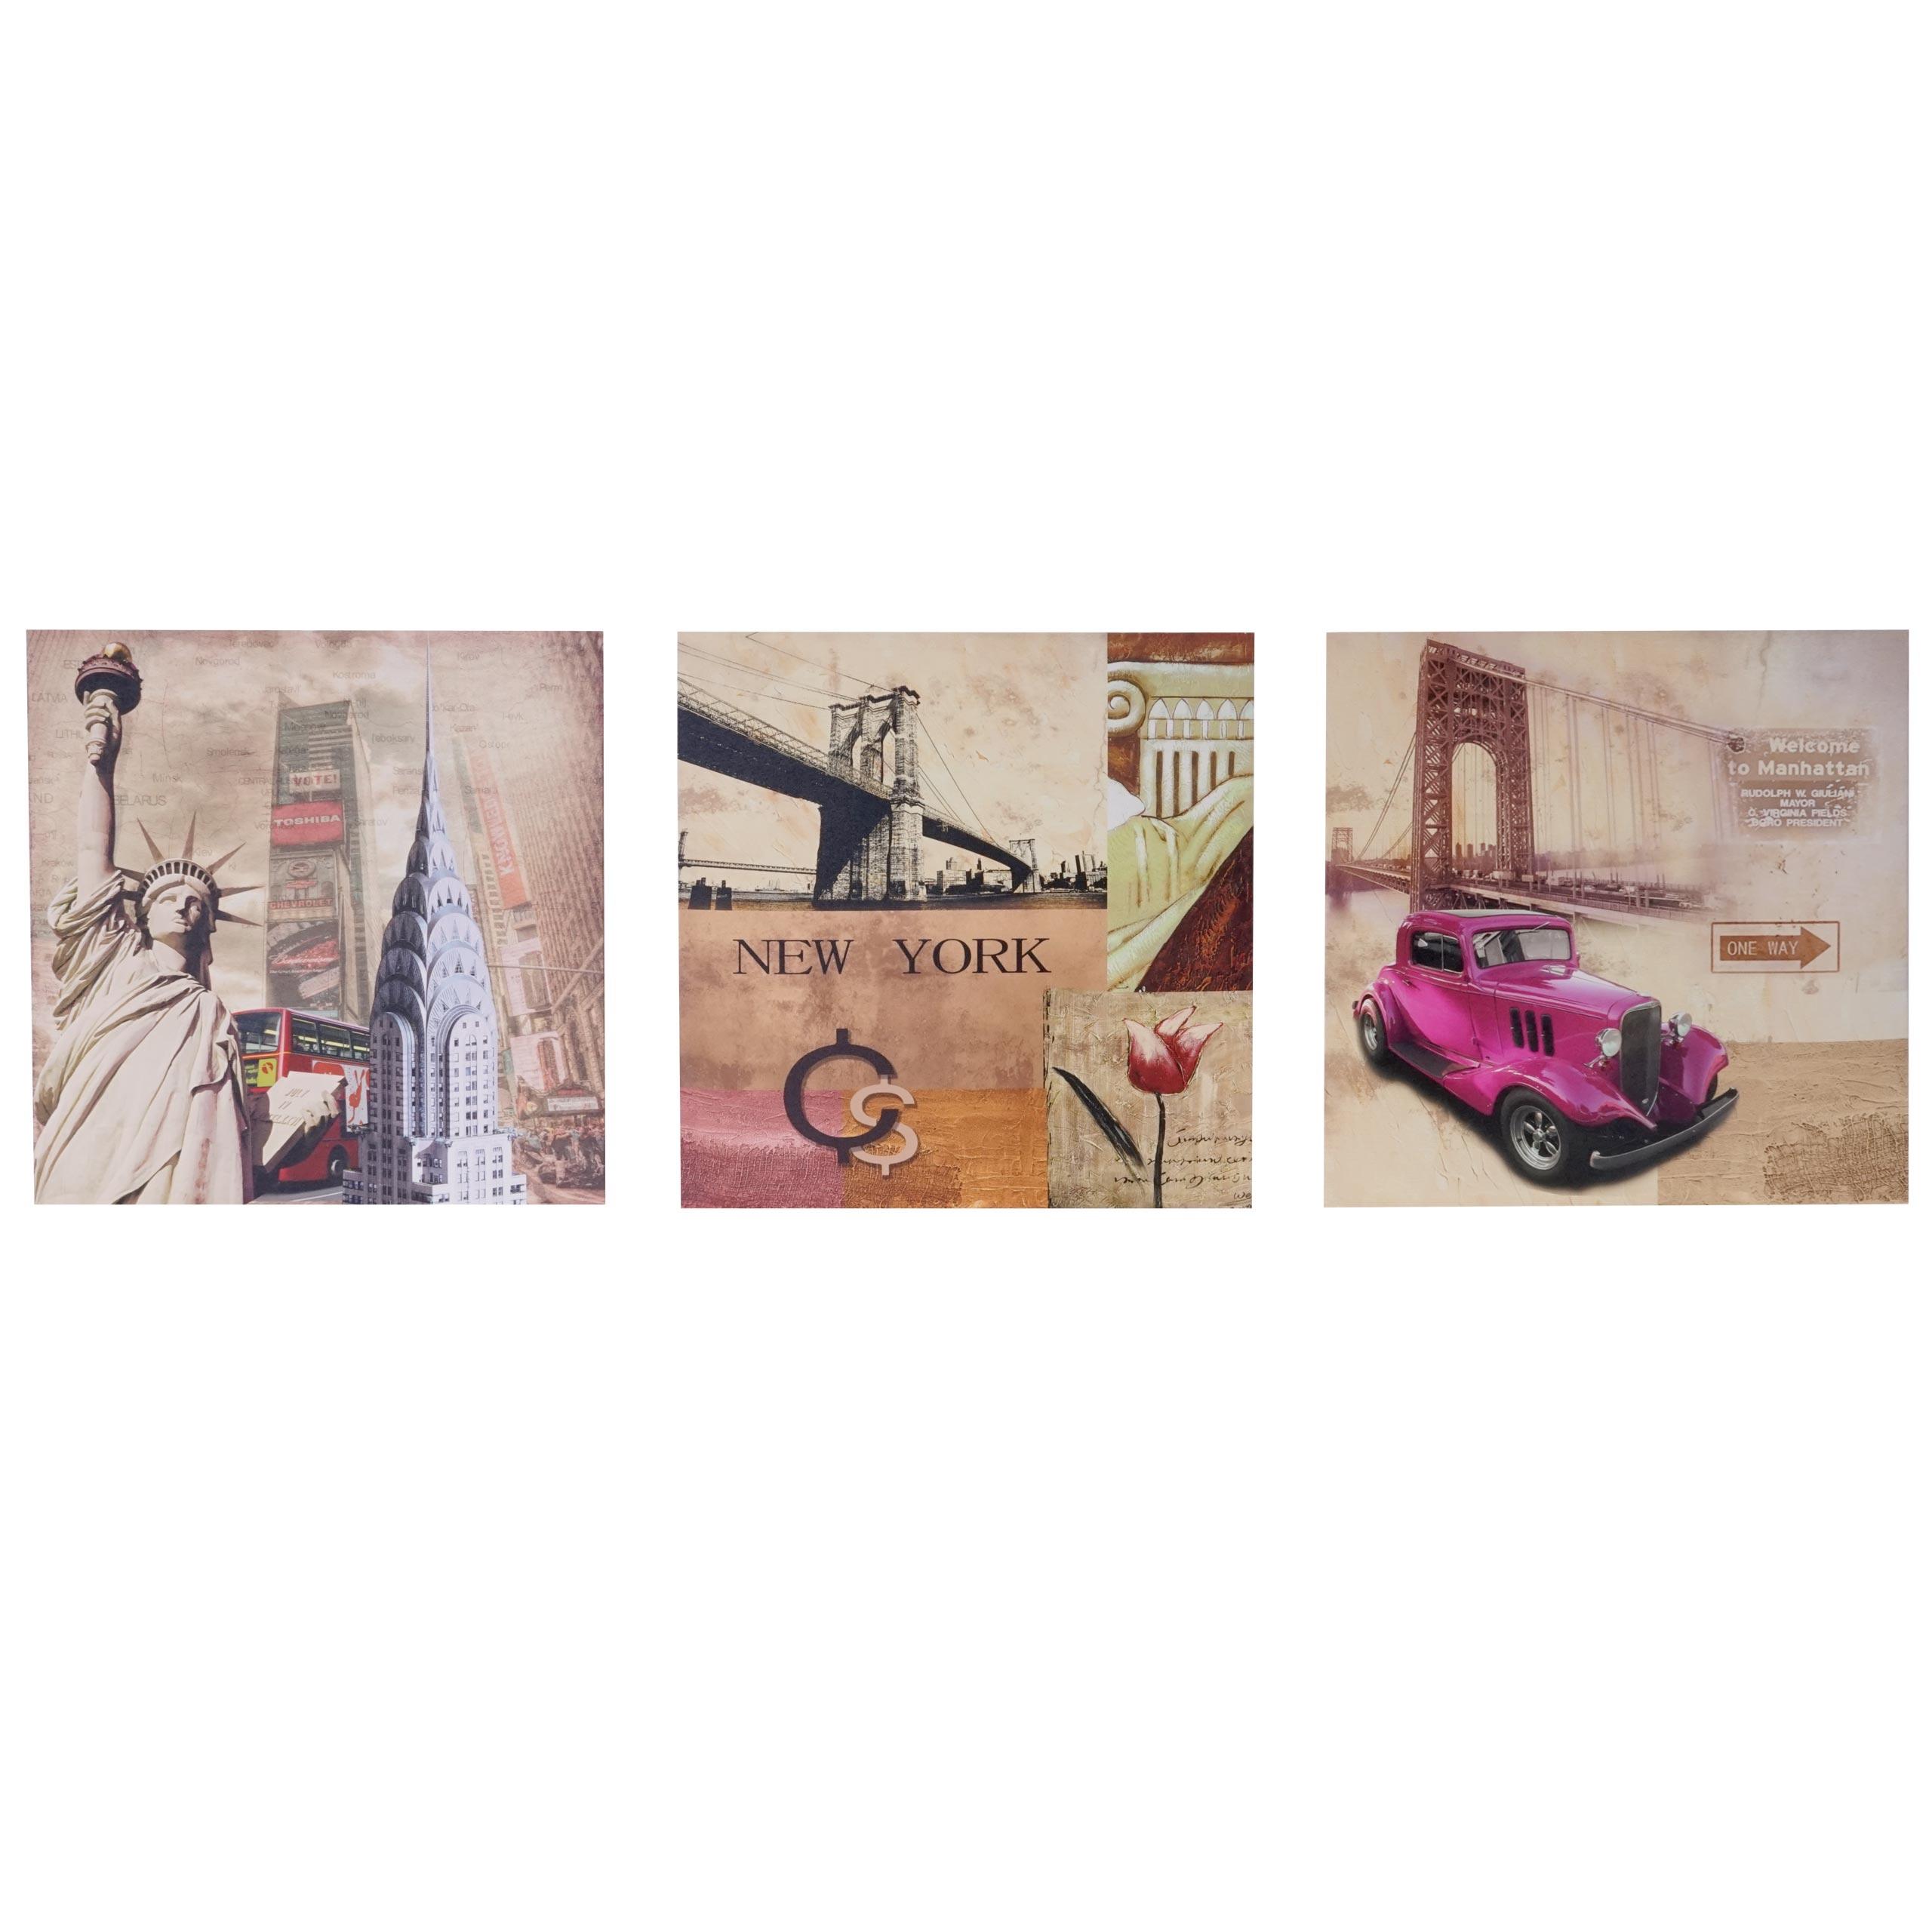 leinwandbild t376 wandbild keilrahmenbild kunstdruck 3. Black Bedroom Furniture Sets. Home Design Ideas